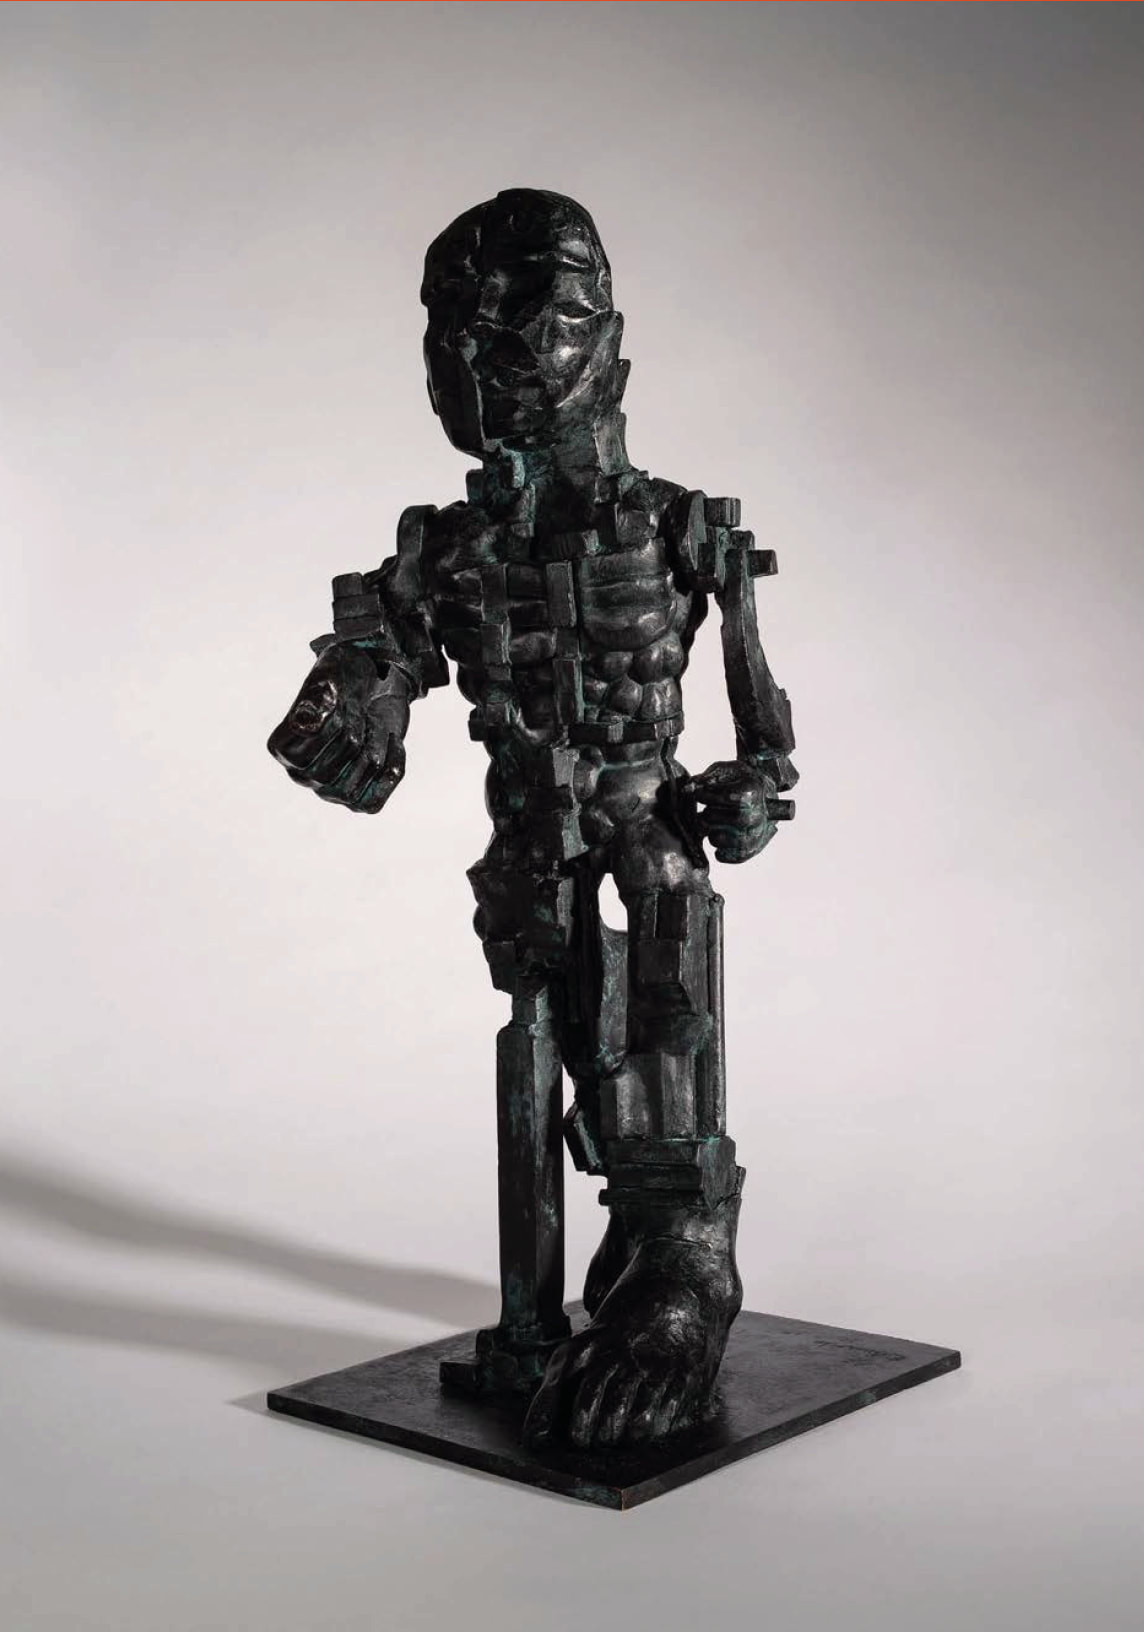 "<span class=""link fancybox-details-link""><a href=""/artists/60-eduardo-paolozzi/works/401-eduardo-paolozzi-vulcan-1998/"">View Detail Page</a></span><div class=""artist""><strong>Eduardo Paolozzi</strong></div> <div class=""title""><em>Vulcan</em>, 1998</div> <div class=""signed_and_dated"">signed (inscribed) 'Paolozzi' a/c<br /> </div> <div class=""medium"">Bronze - a/c (after edition of 2)</div> <div class=""dimensions"">60.5 x 24 x 29cm</div>"